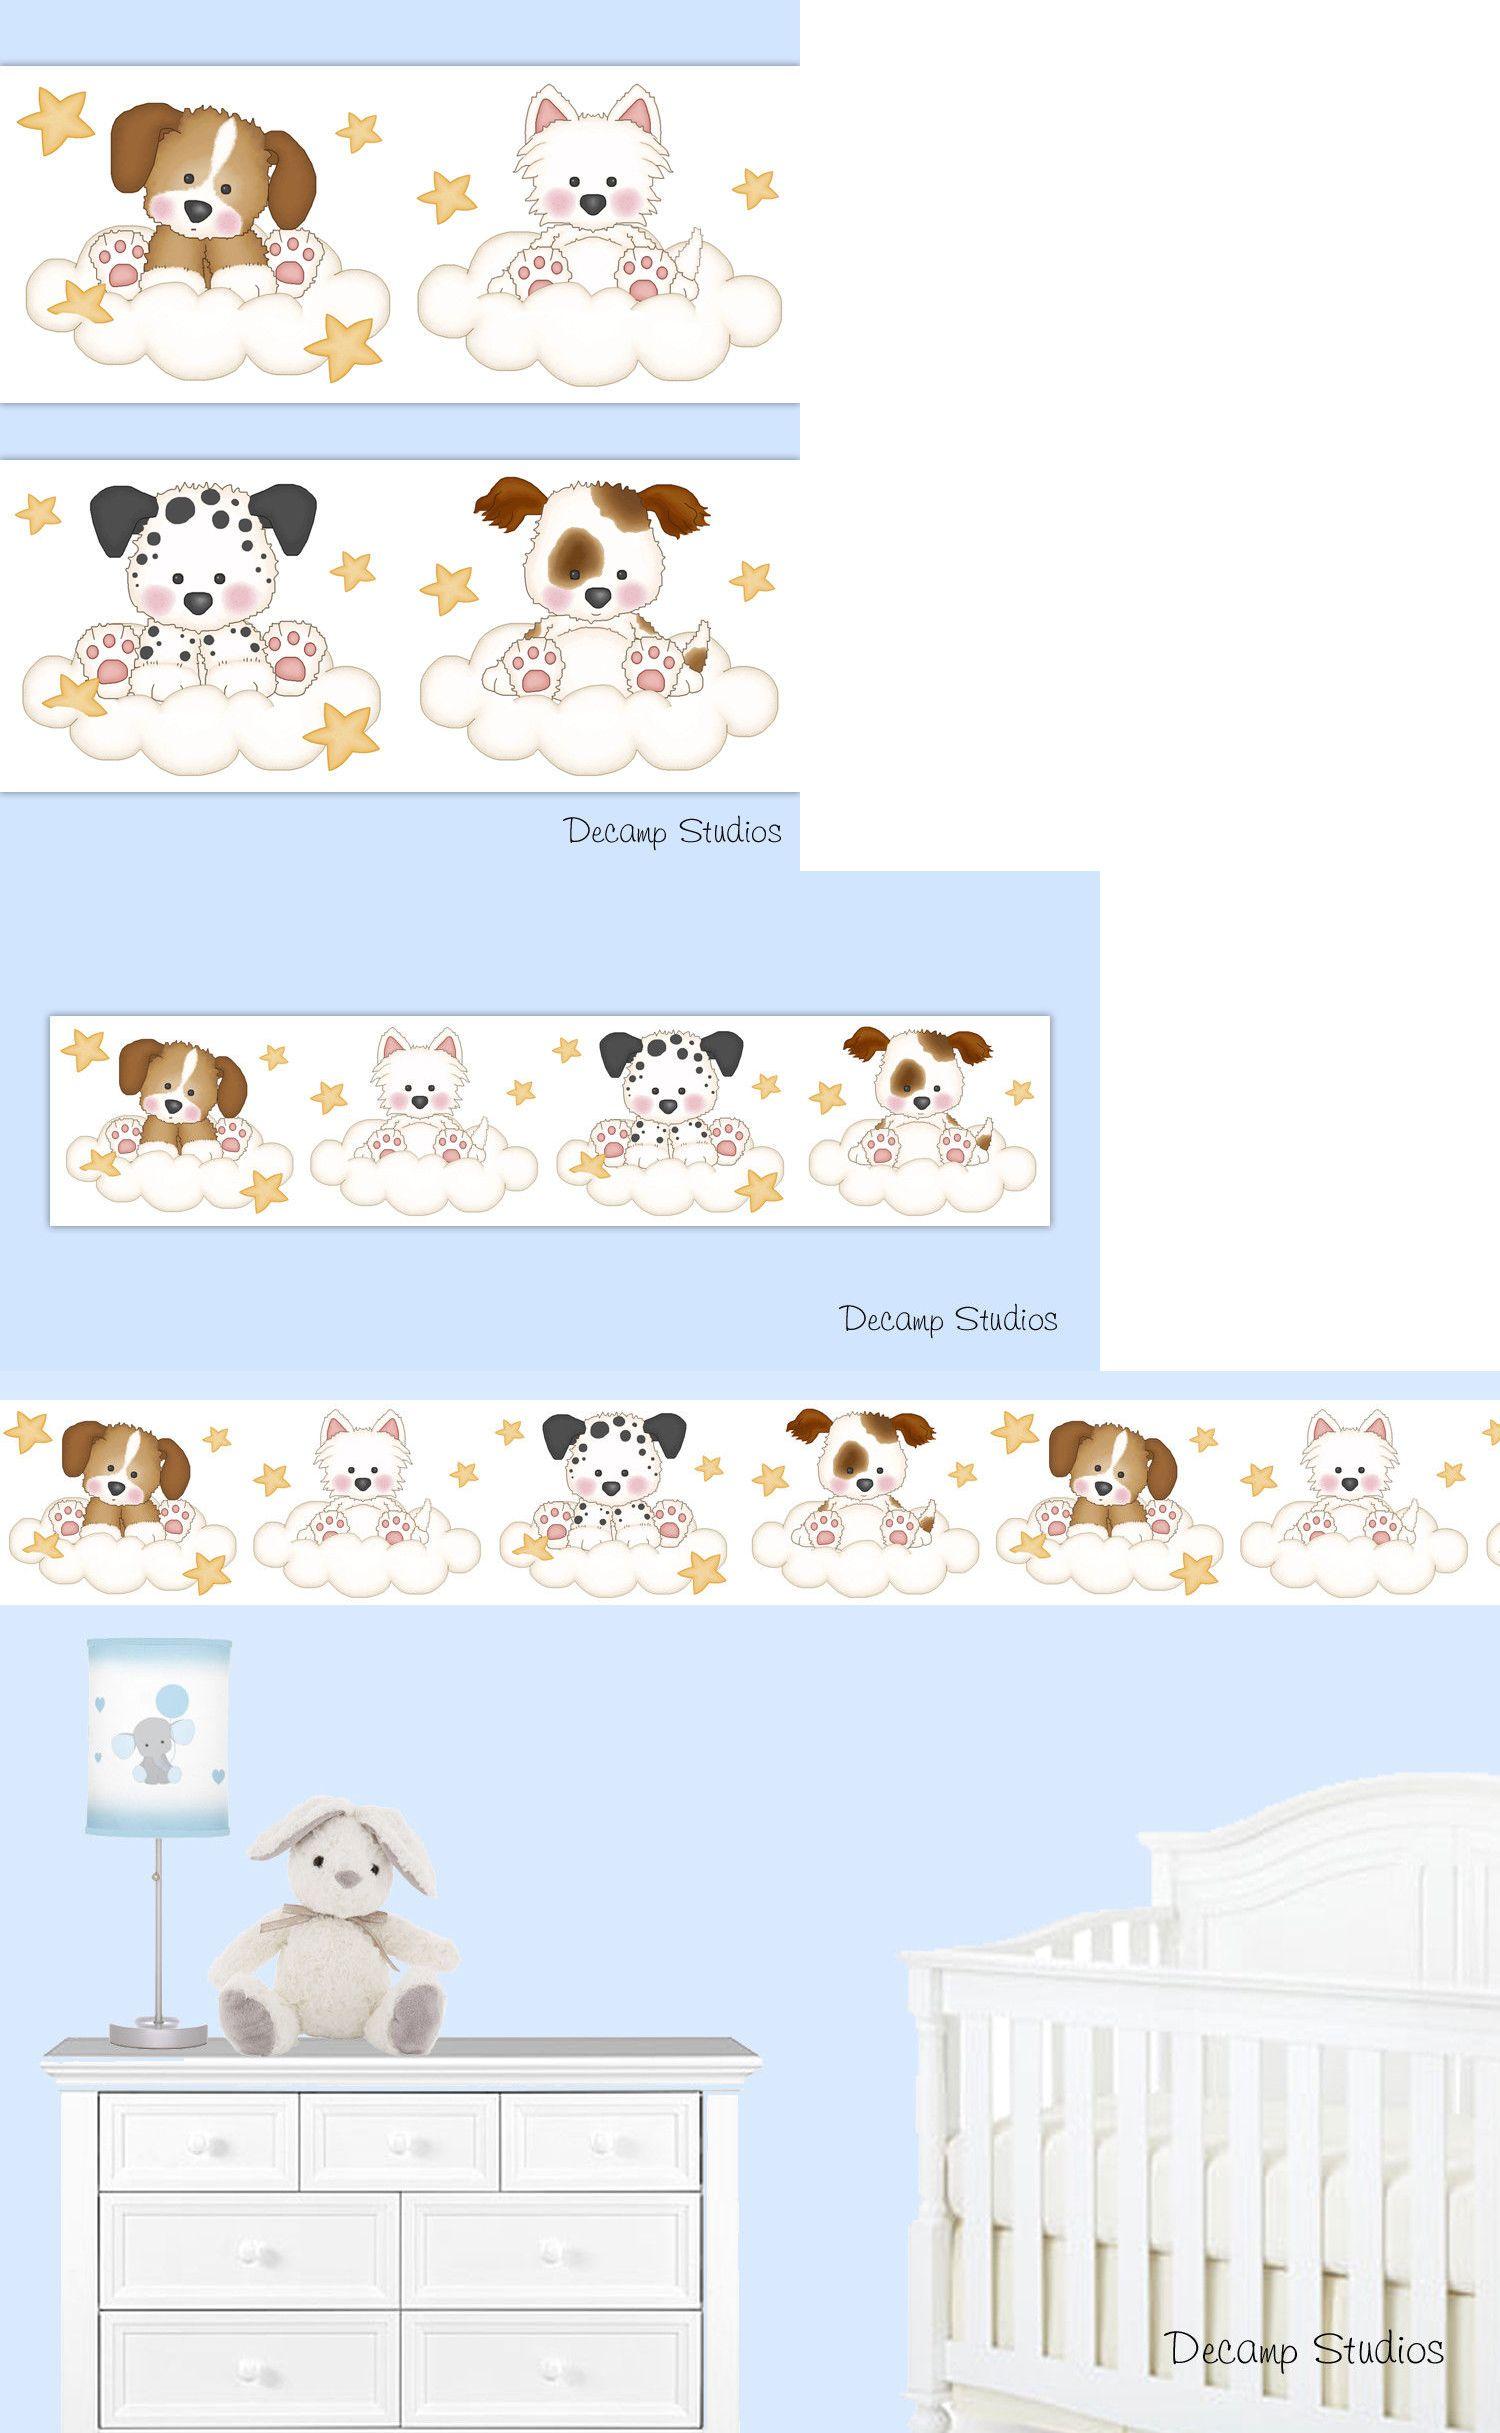 Wallpaper Borders 37636 Puppy Nursery Wallpaper Border Cloud Stars Wall Art Baby Stickers Kids Dog Room Baby Wall Art Nursery Wallpaper Border Baby Room Decor